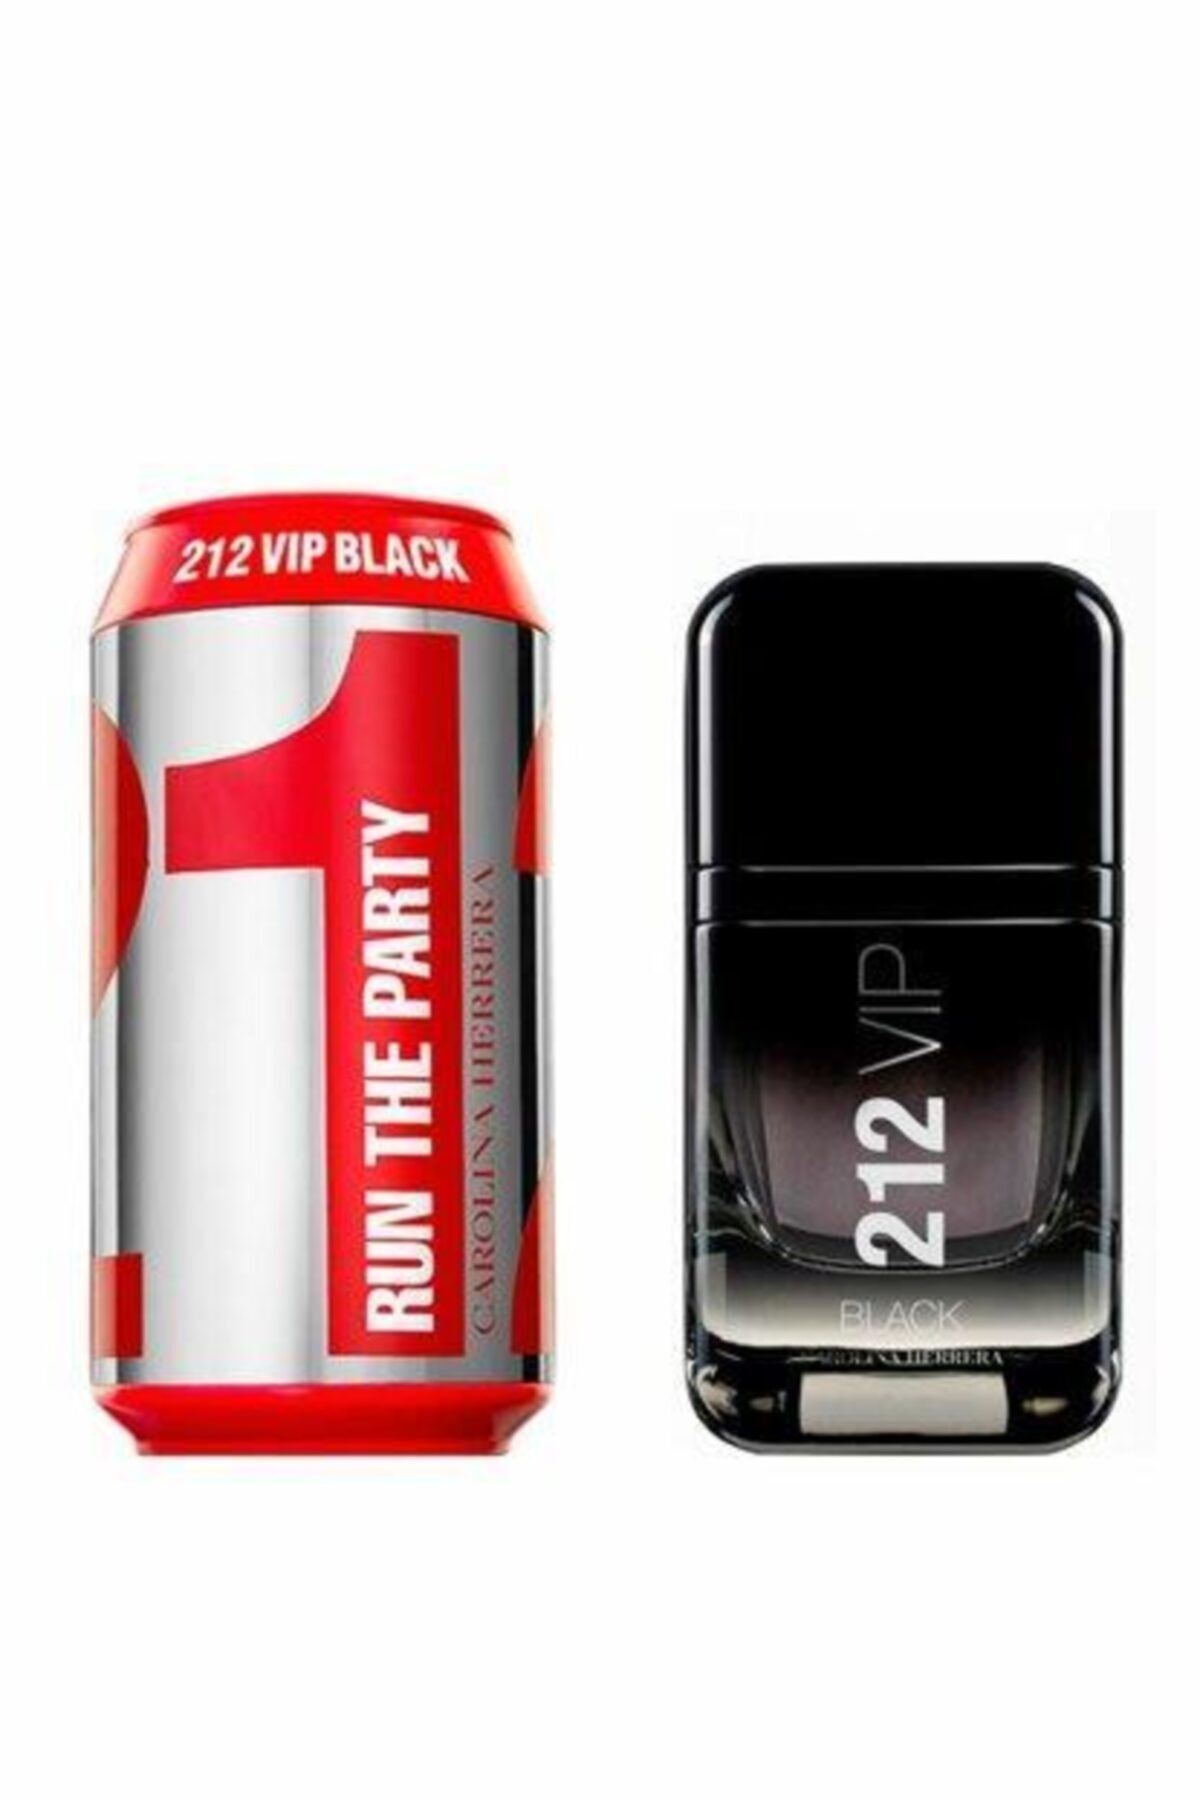 Carolina Herrera 212 Vıp Black Collector Özel Seri Edp 100 ml Erkek Parfüm 8411061944028 1